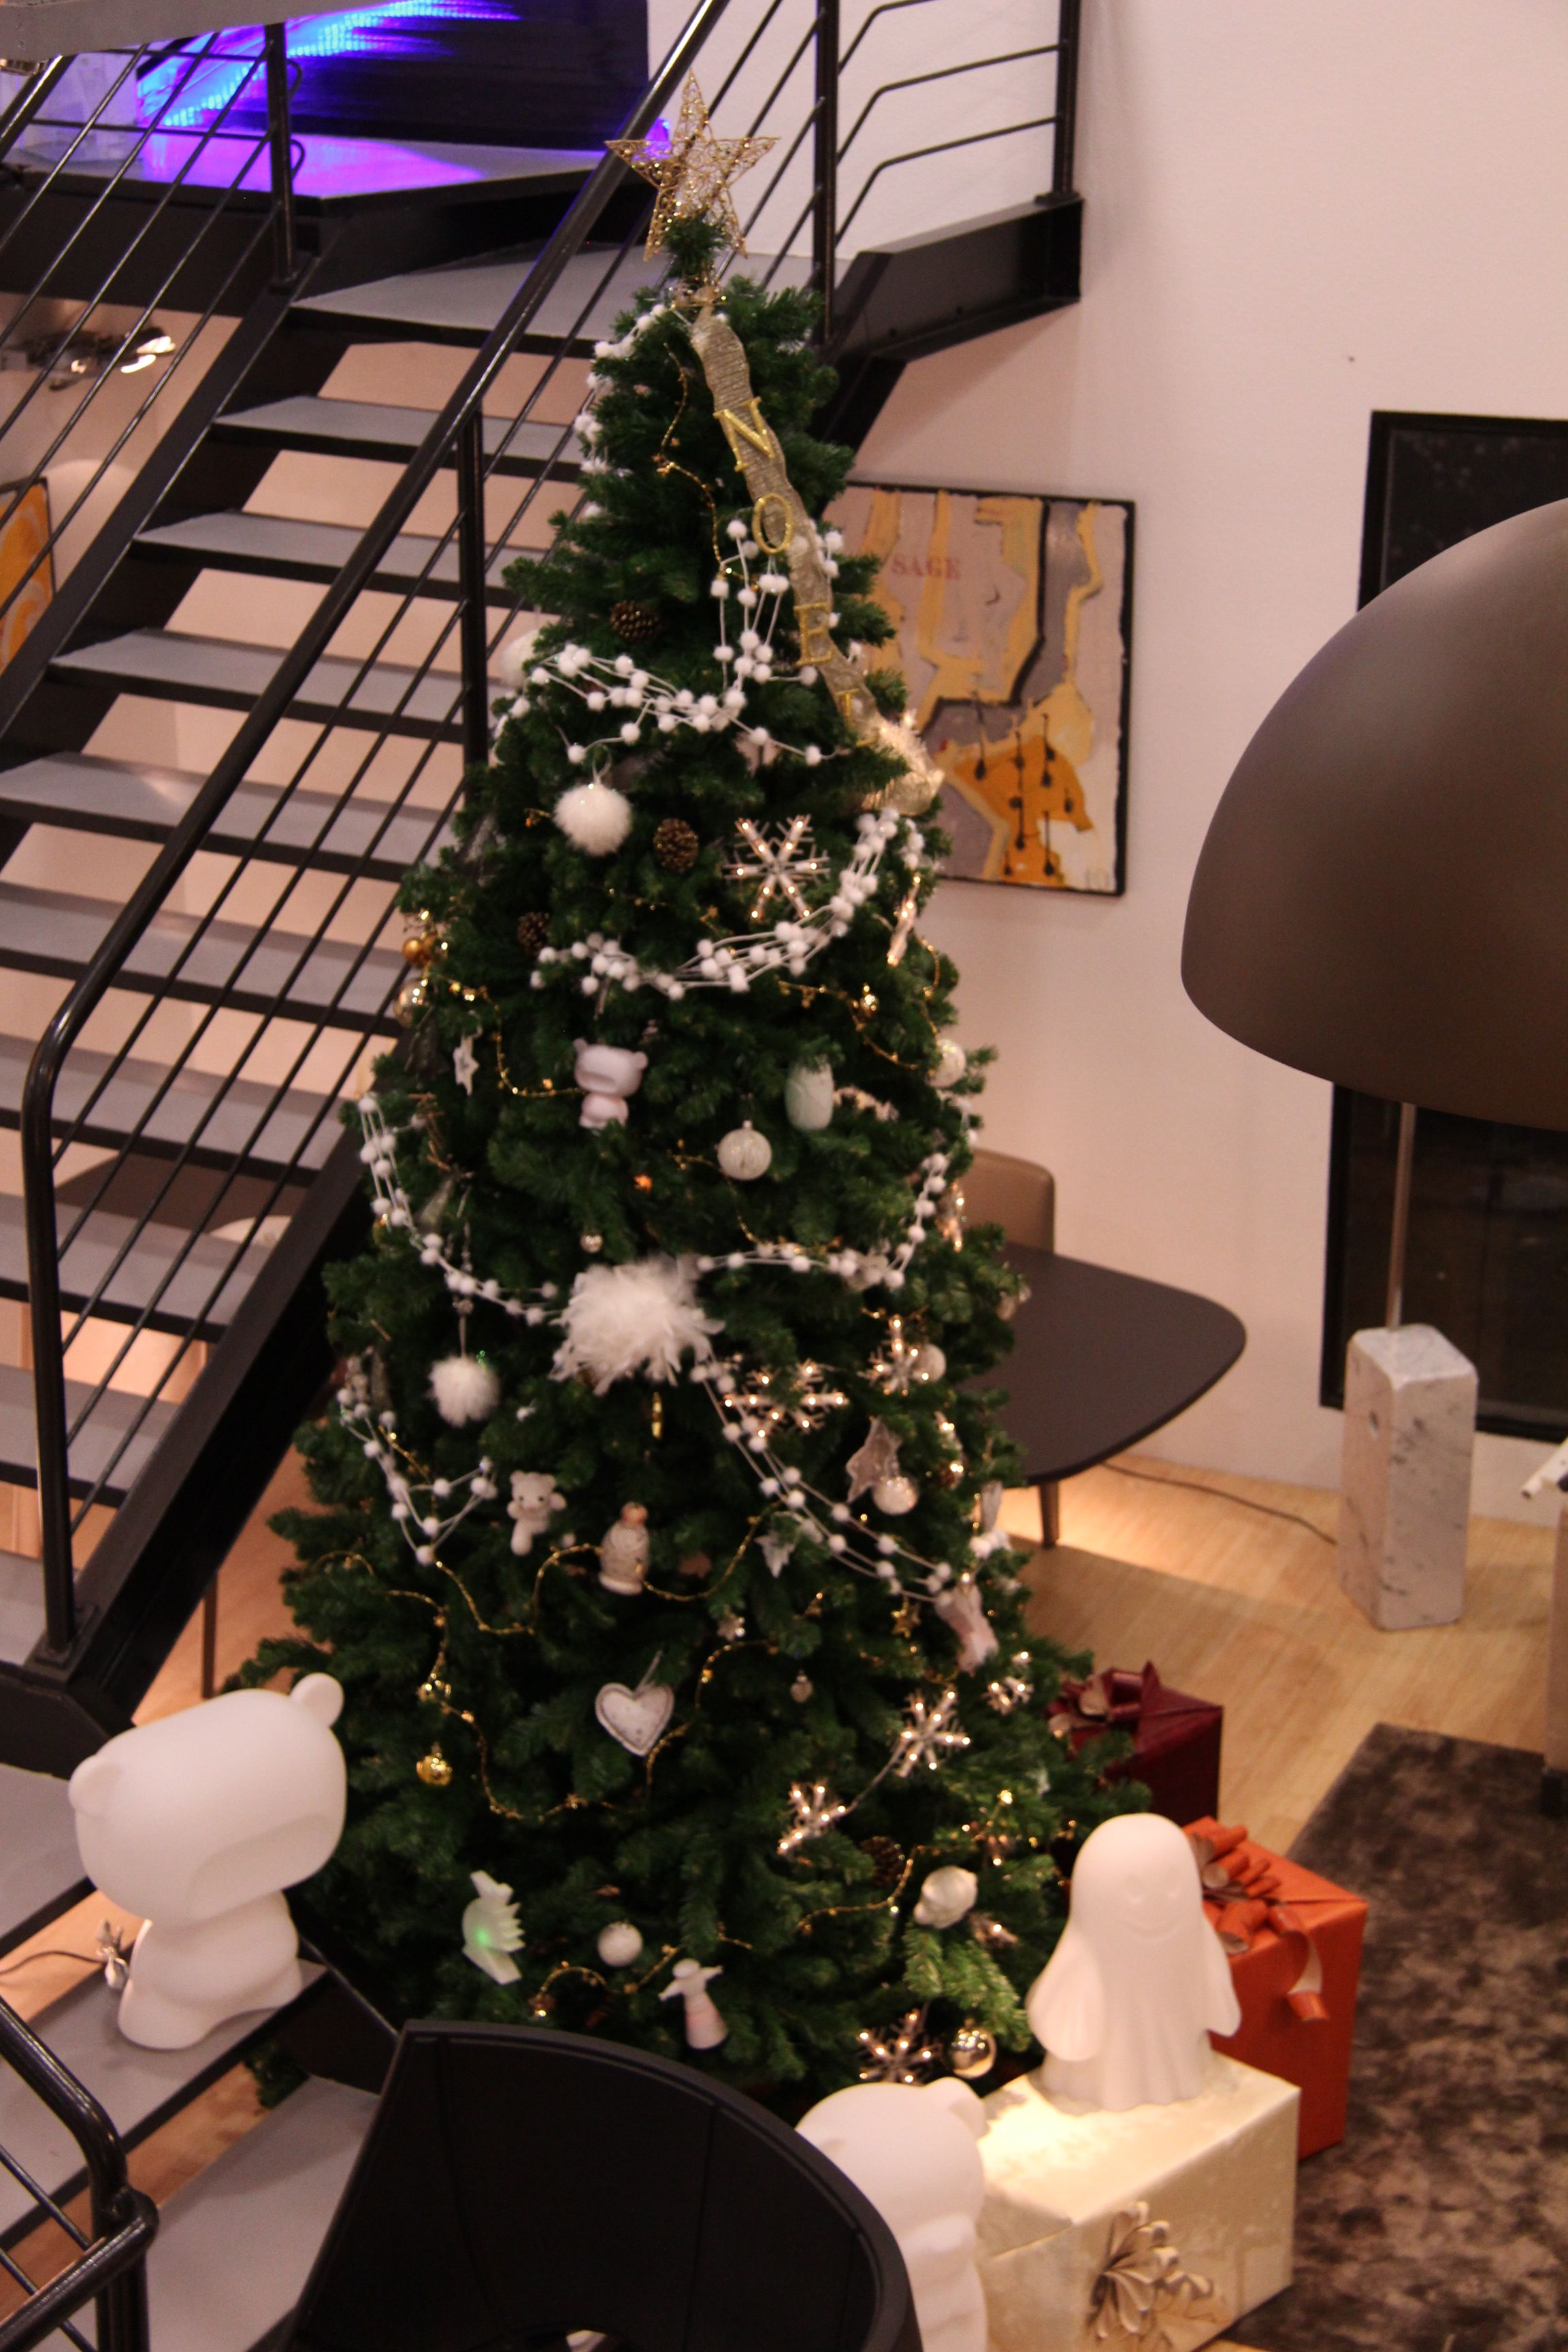 Sapin De 3 M Chez Espace Contemporain Ambiance Noel Noel 2014 Esprit De Noel